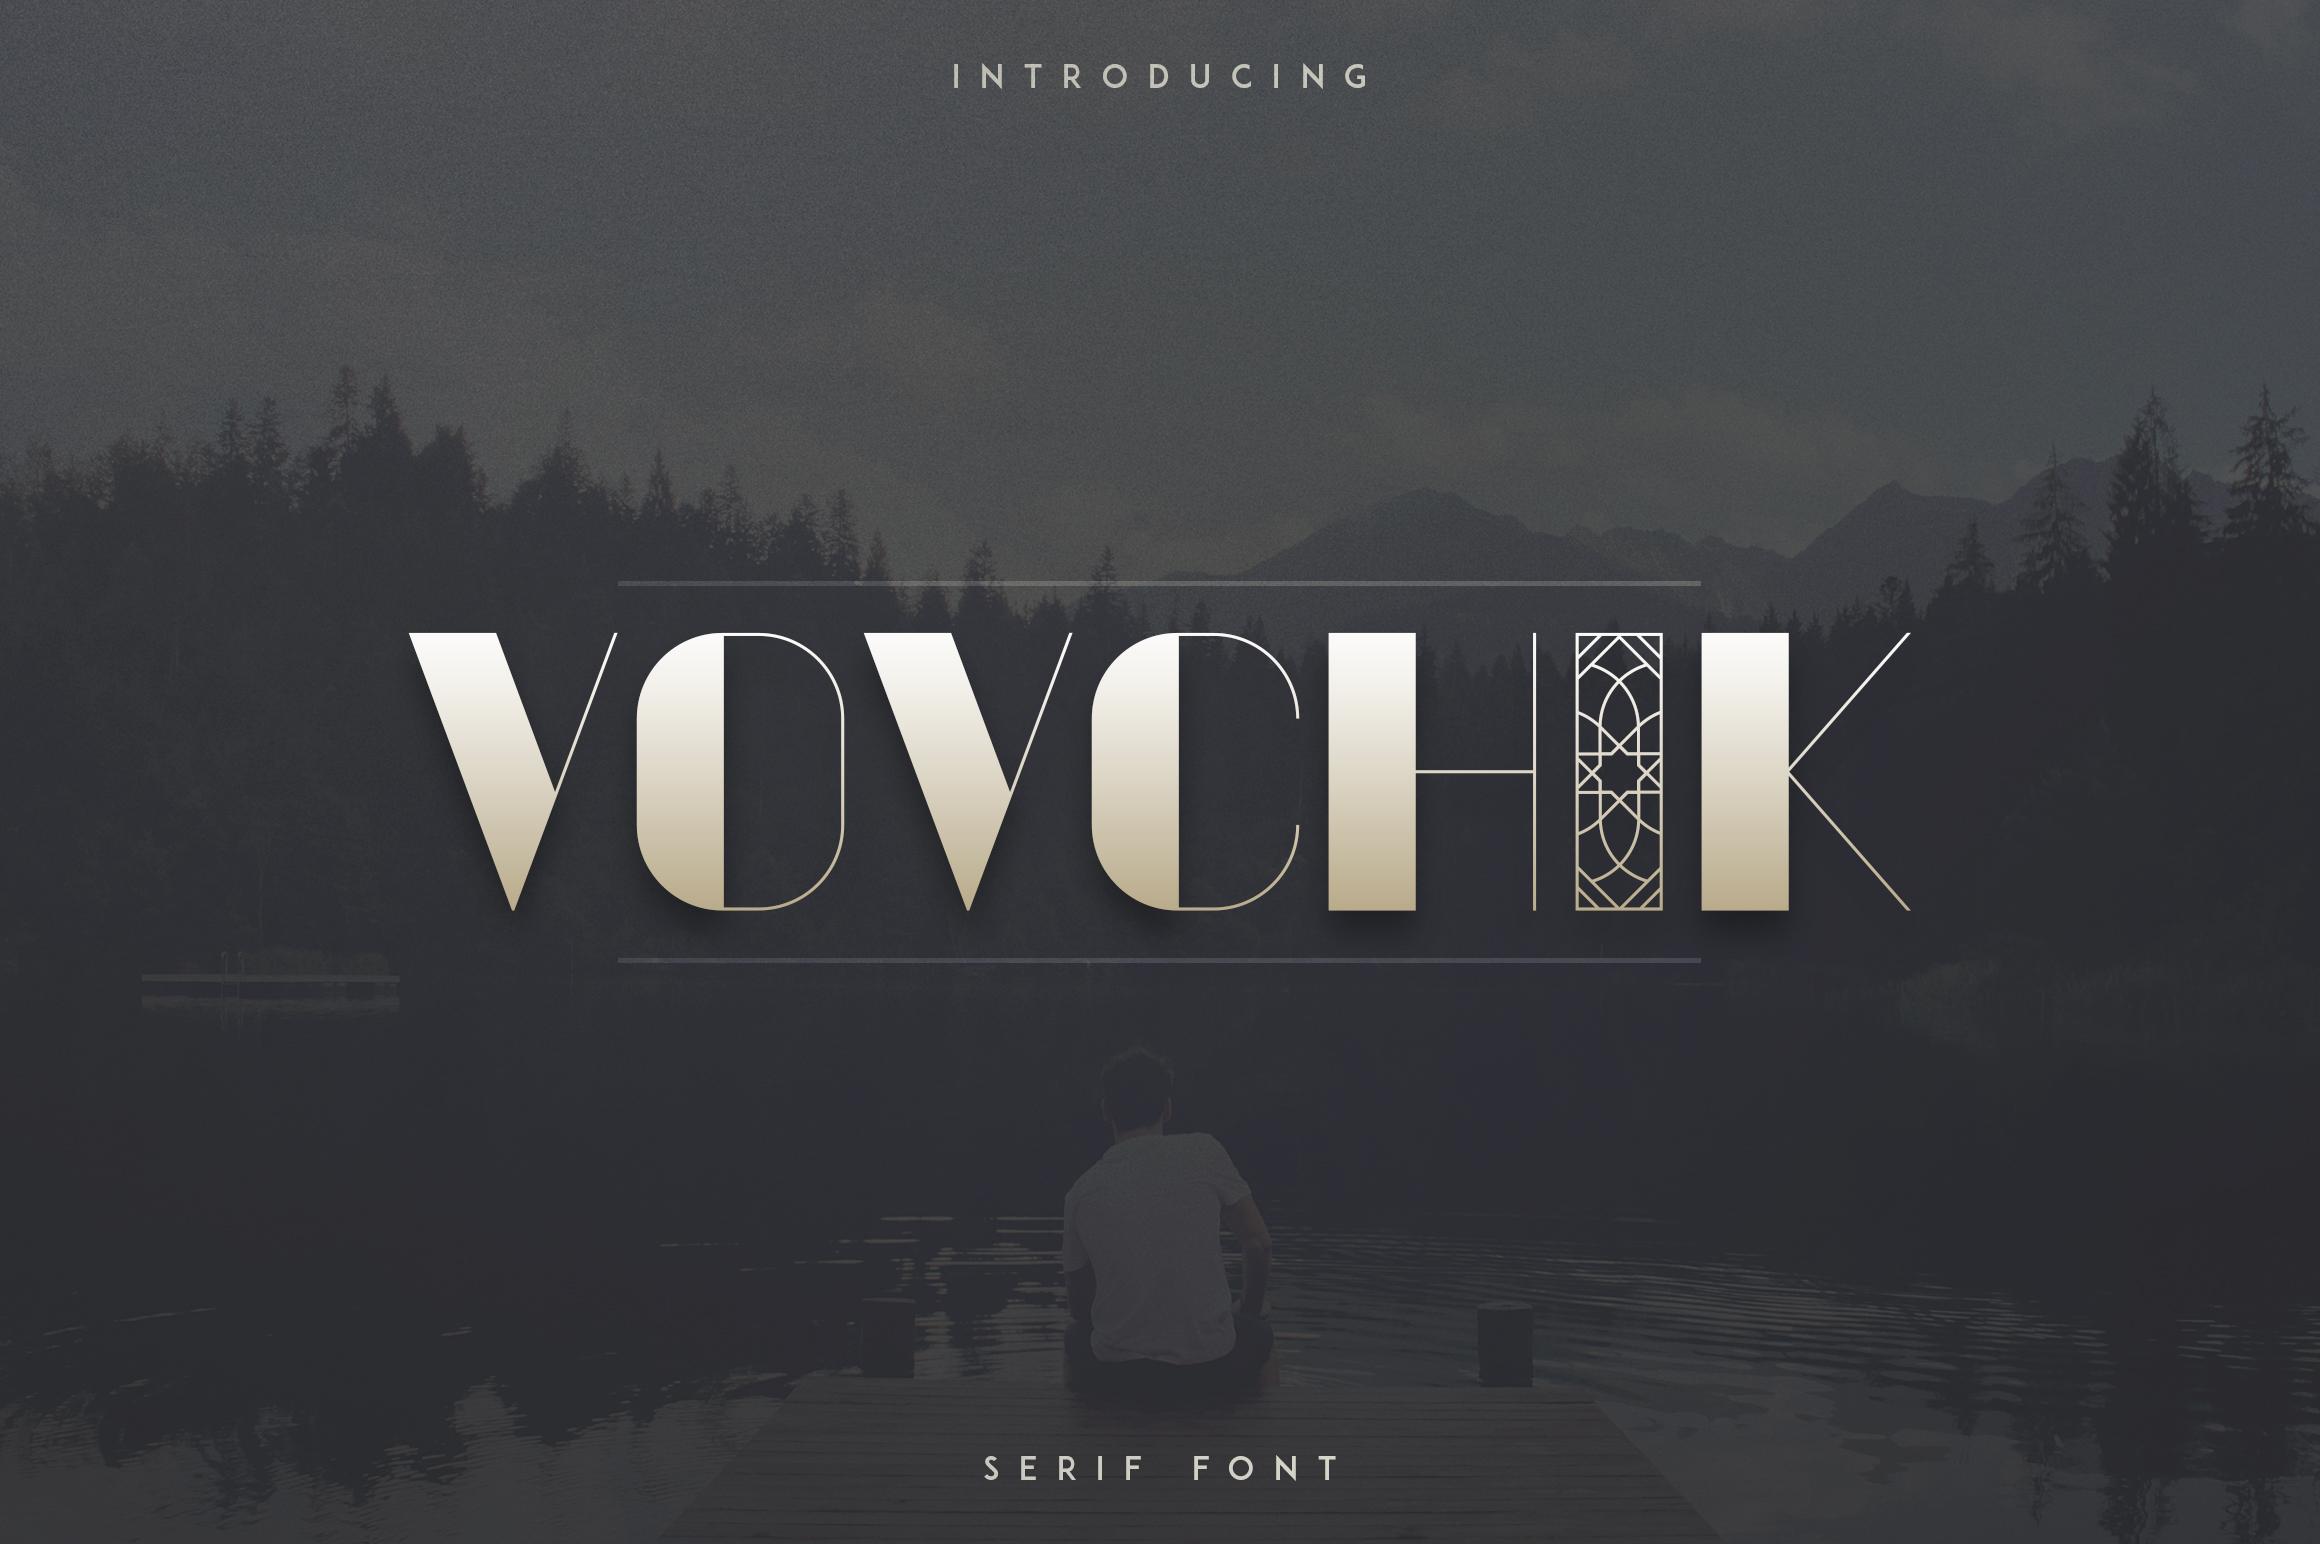 Vovchik Serif Font example image 1